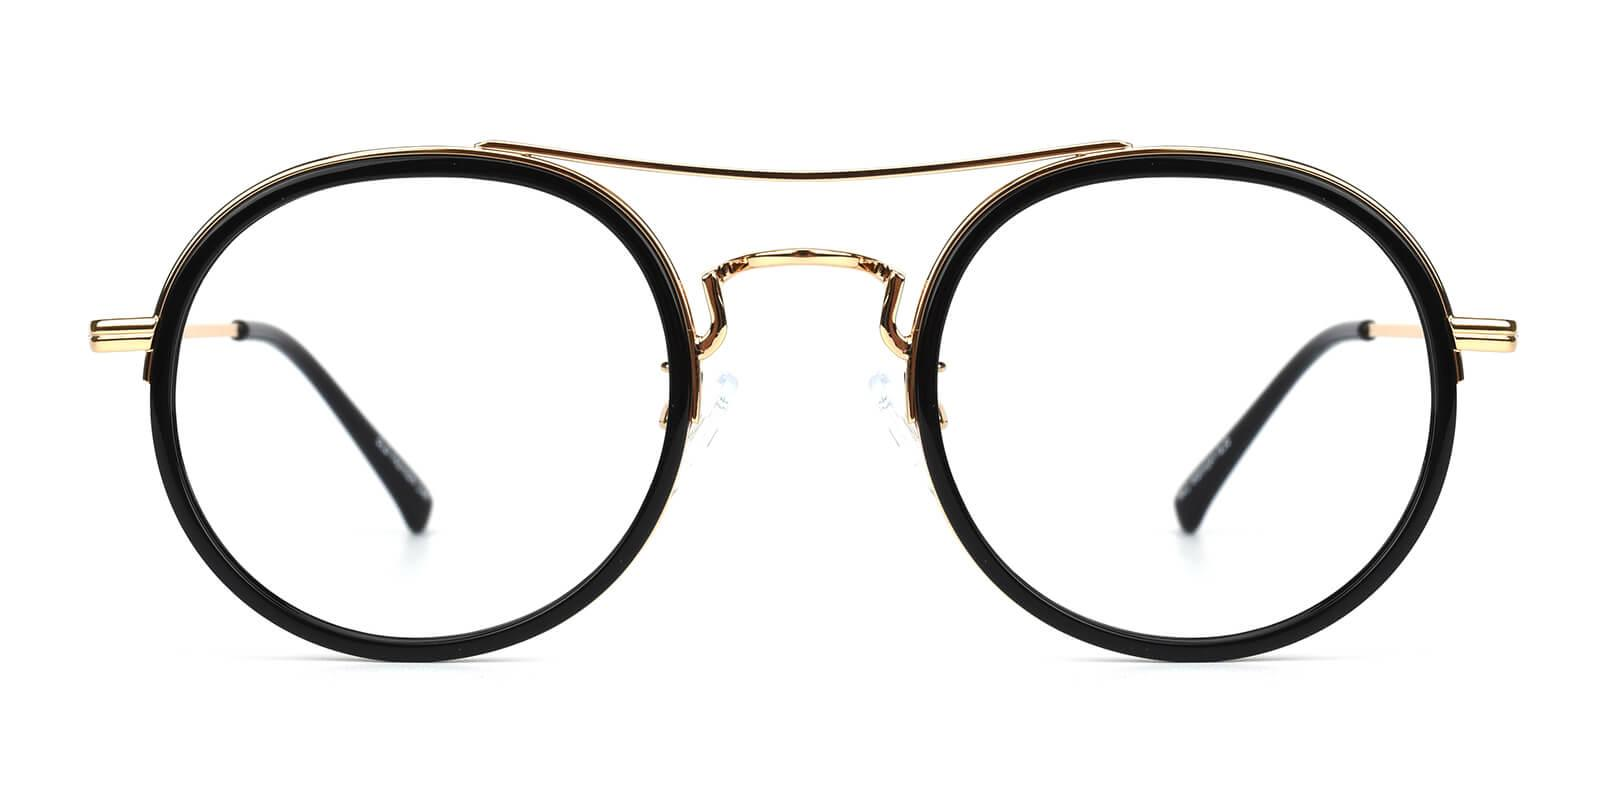 Teddy-Gold-Aviator-Combination-Eyeglasses-additional2